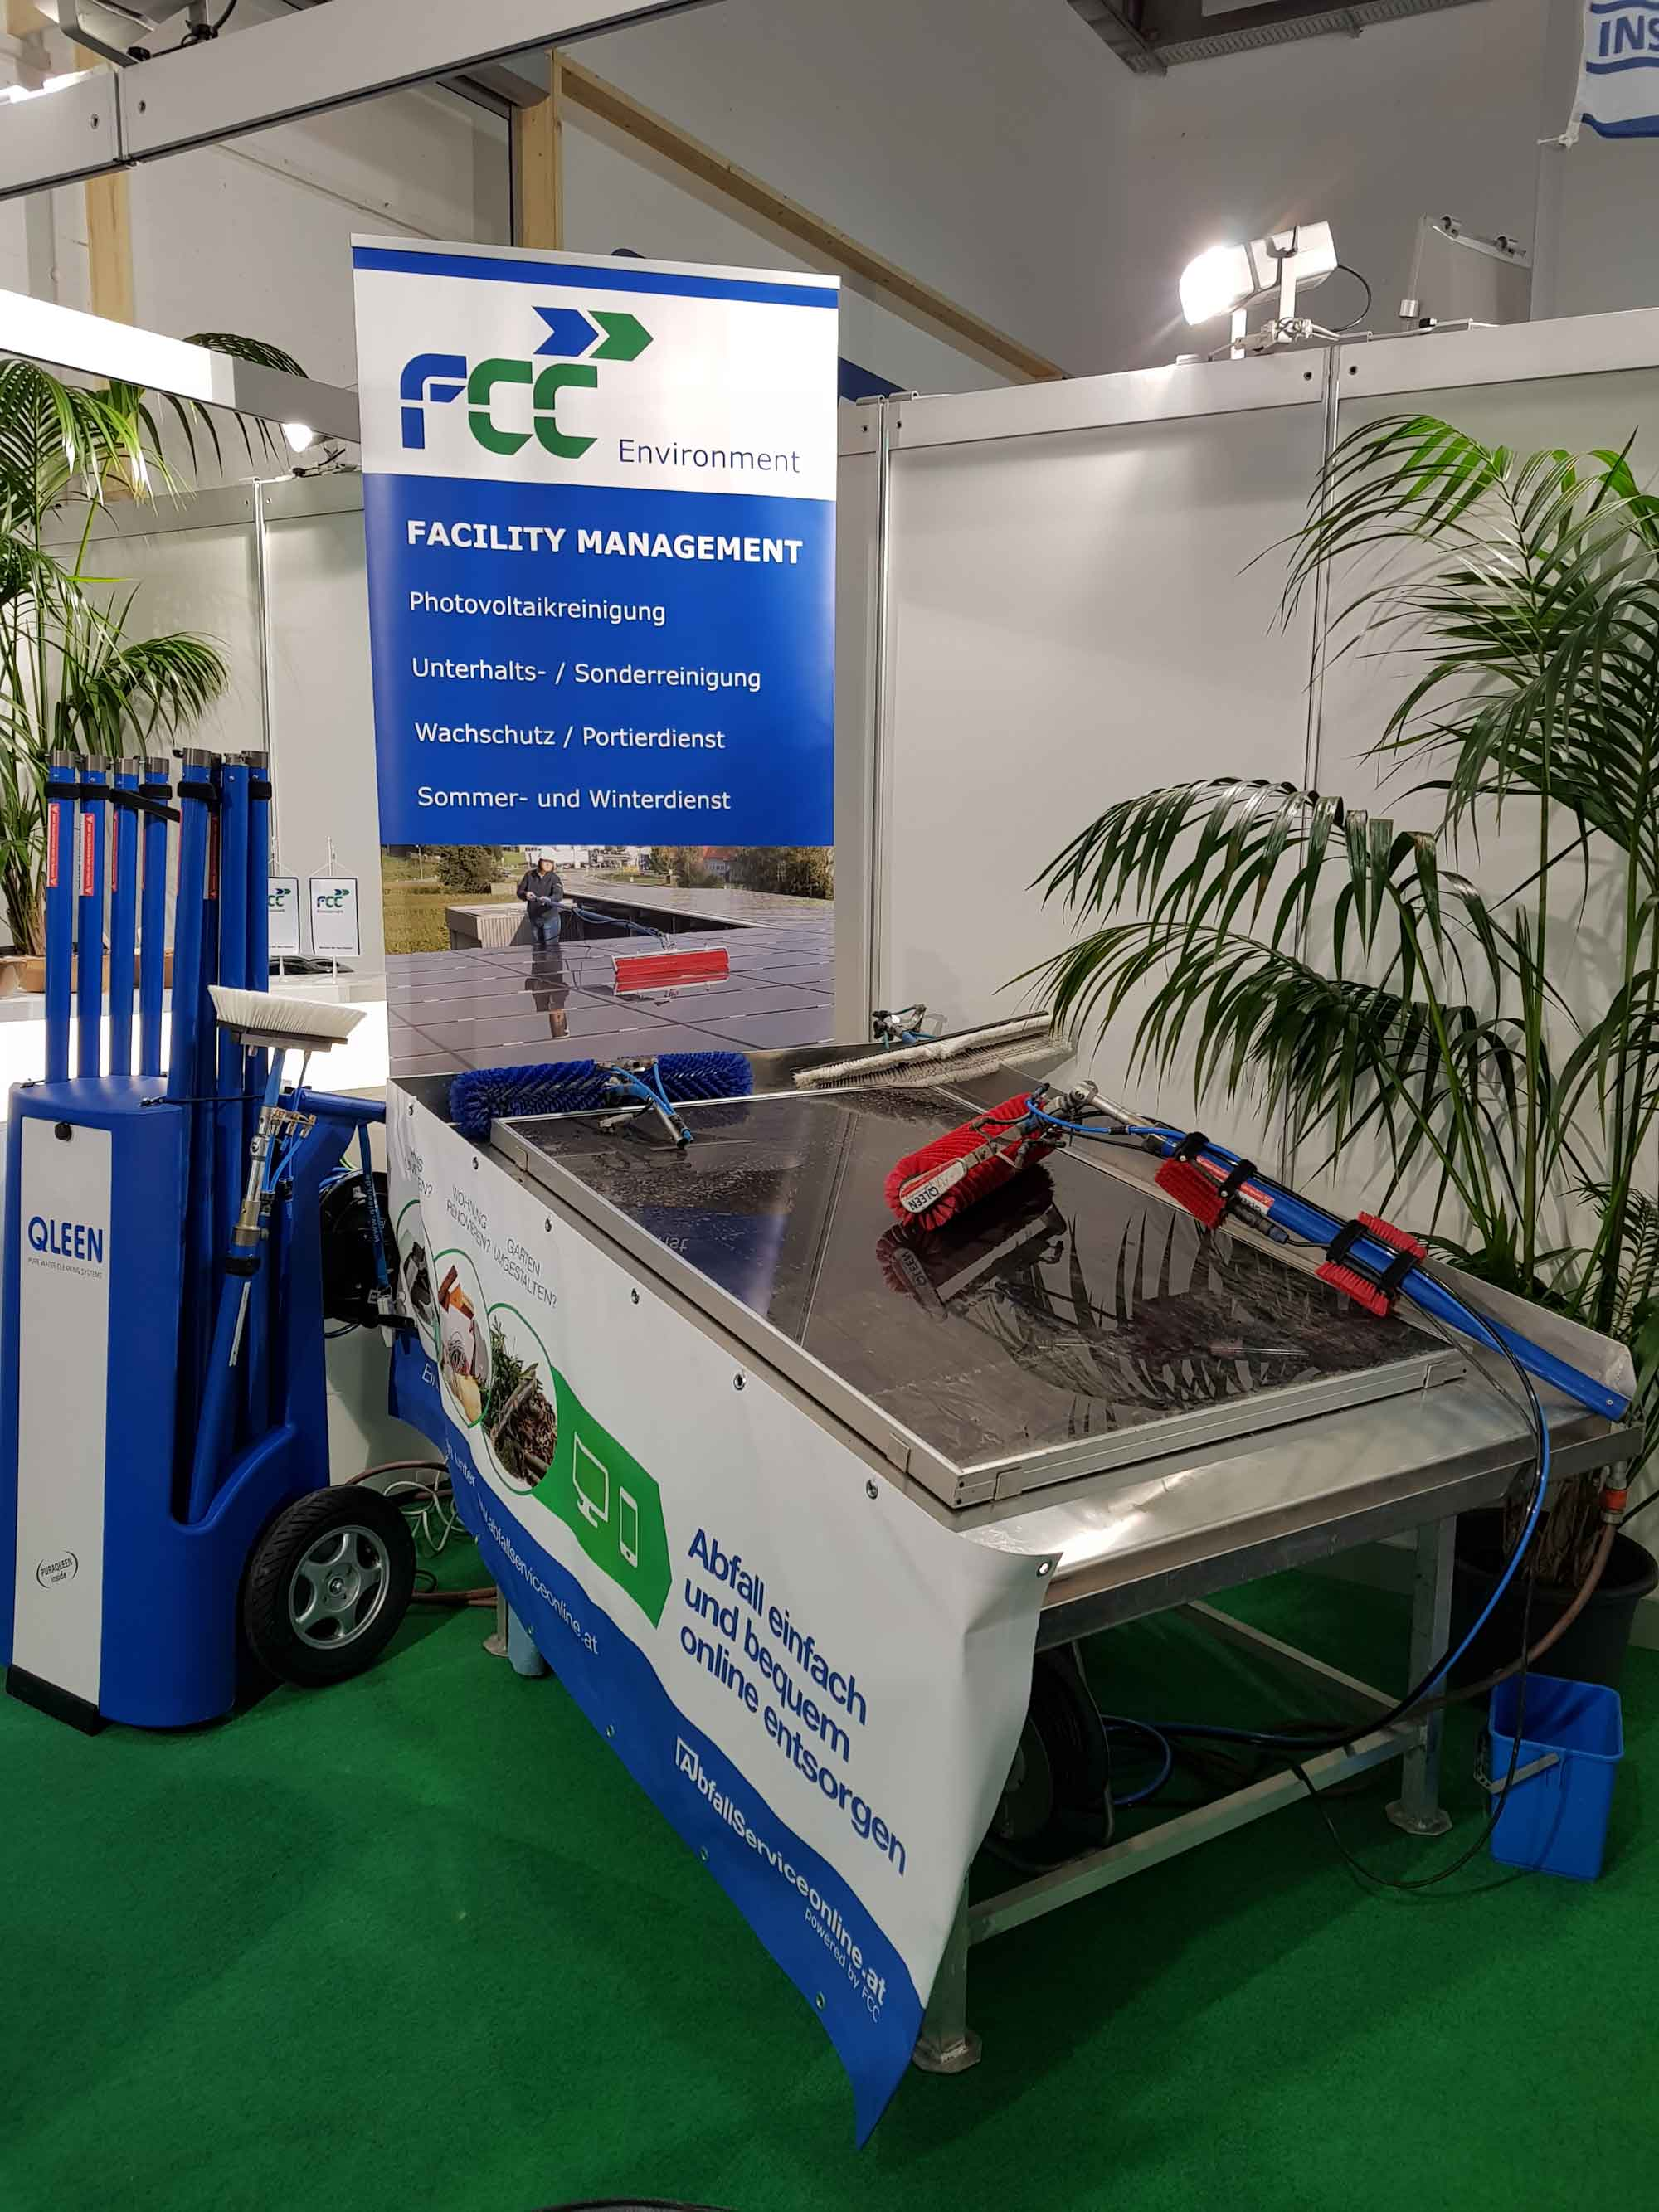 fcc-reinigung-photovoltaik-anlage-haeuselbauermesse-graz